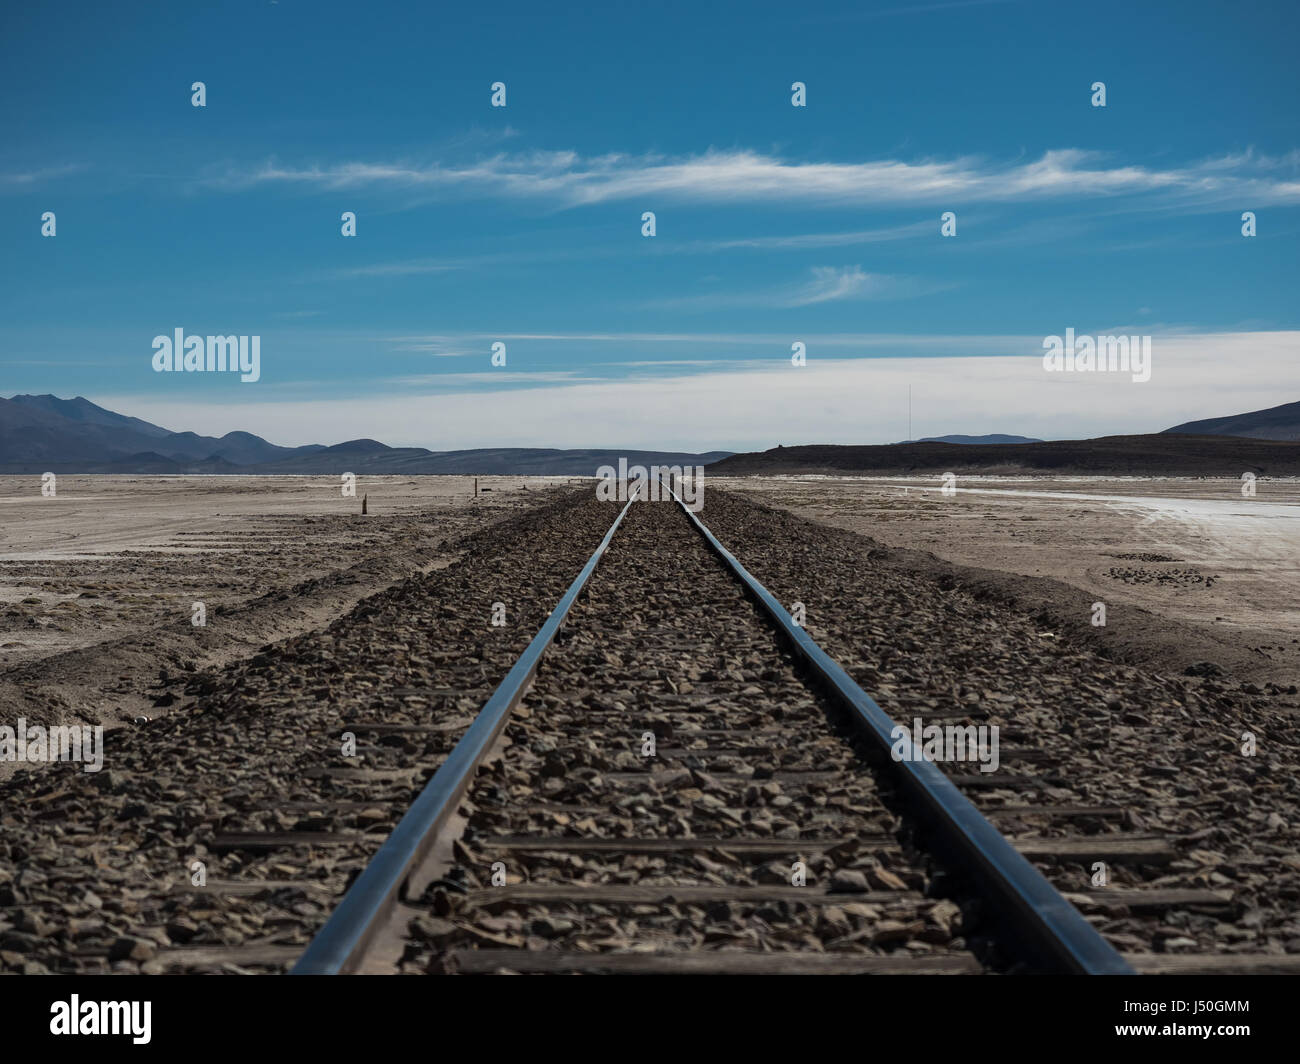 Ferrocarril recta a través del desierto de Atacama, cerca del Salar de Uyuni, Bolivia, América del Sur. Imagen De Stock